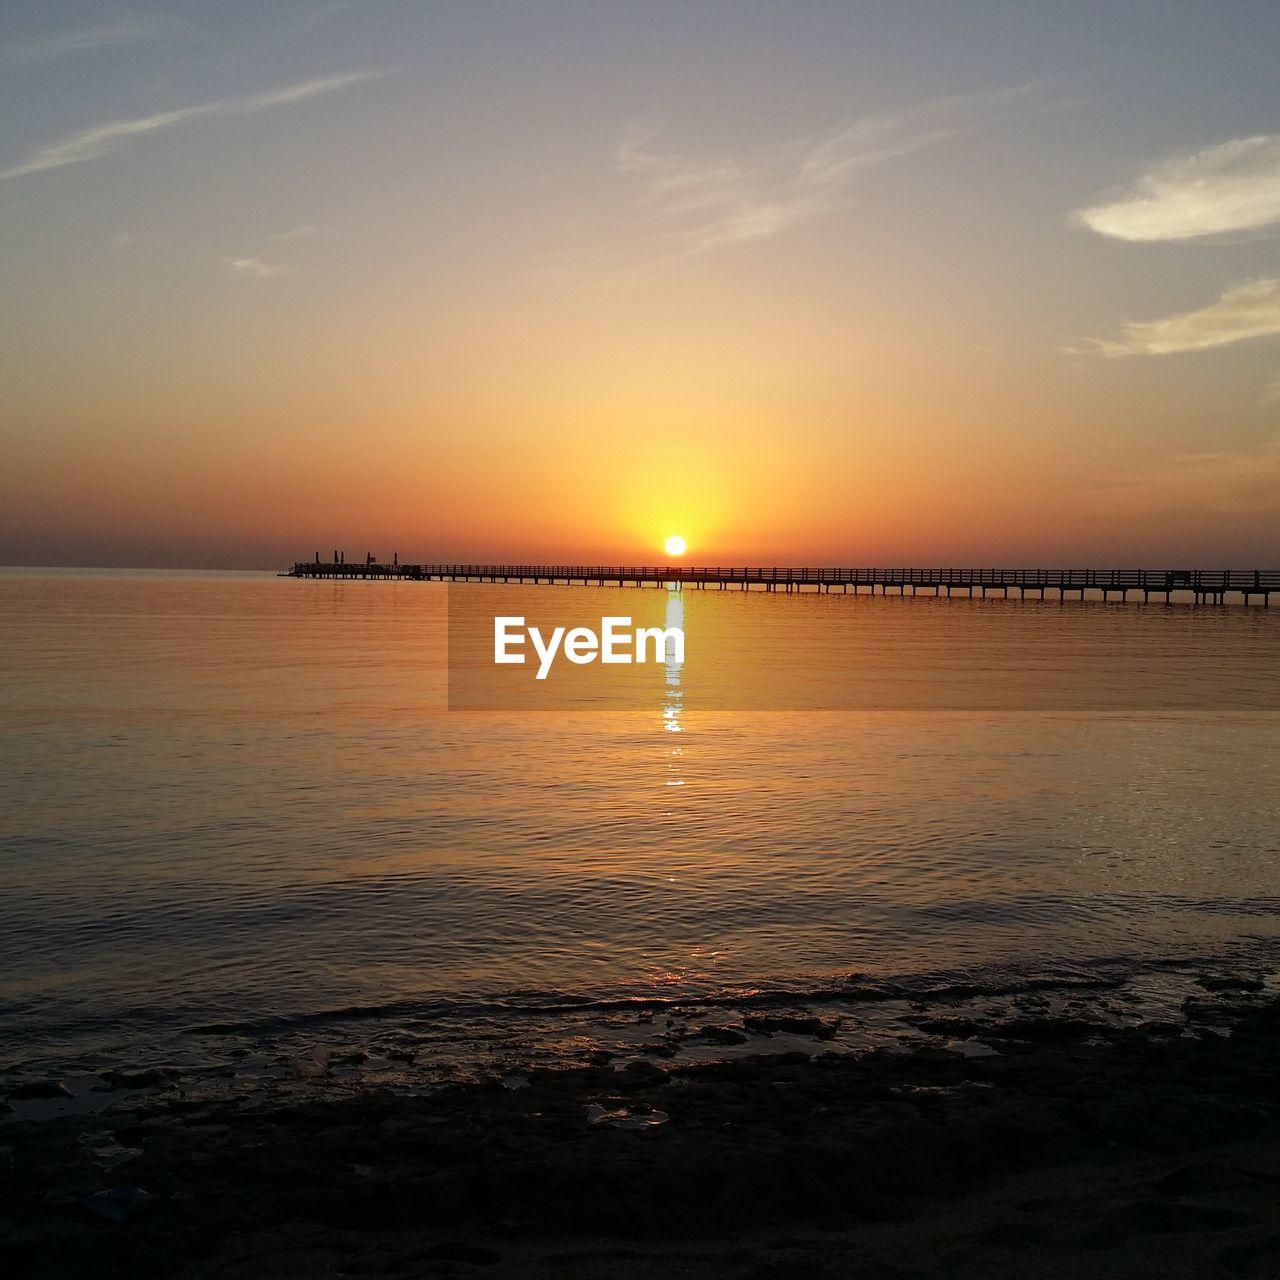 sunset, sky, scenics - nature, beauty in nature, water, tranquil scene, tranquility, sun, sea, orange color, horizon, horizon over water, reflection, nature, idyllic, no people, non-urban scene, sunlight, beach, outdoors, salt flat